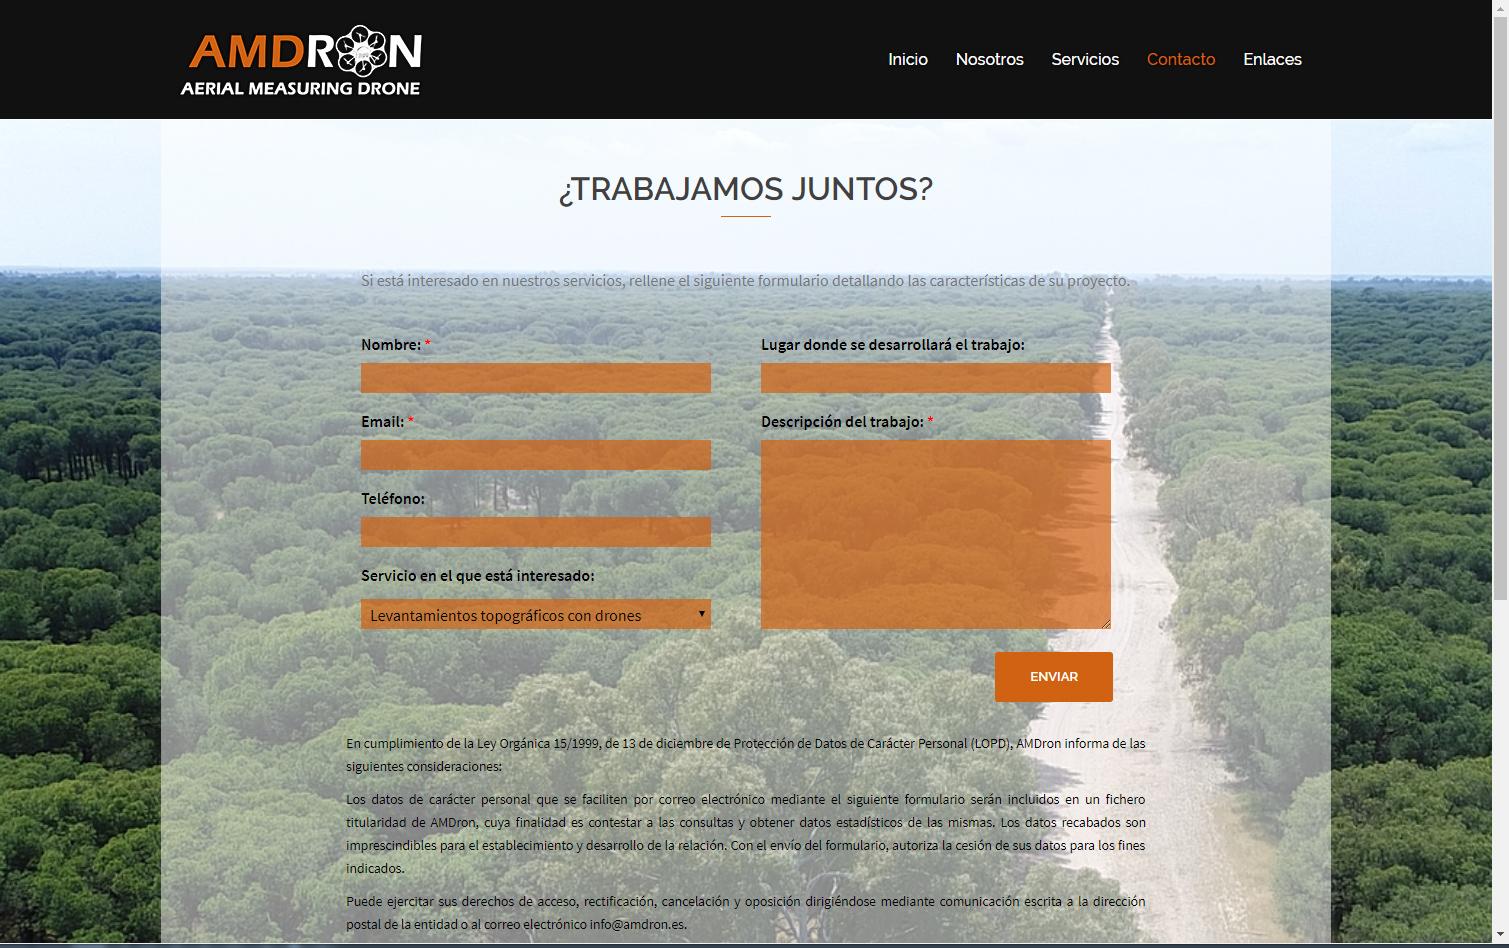 Imagen 4 de 4 - AMDRON